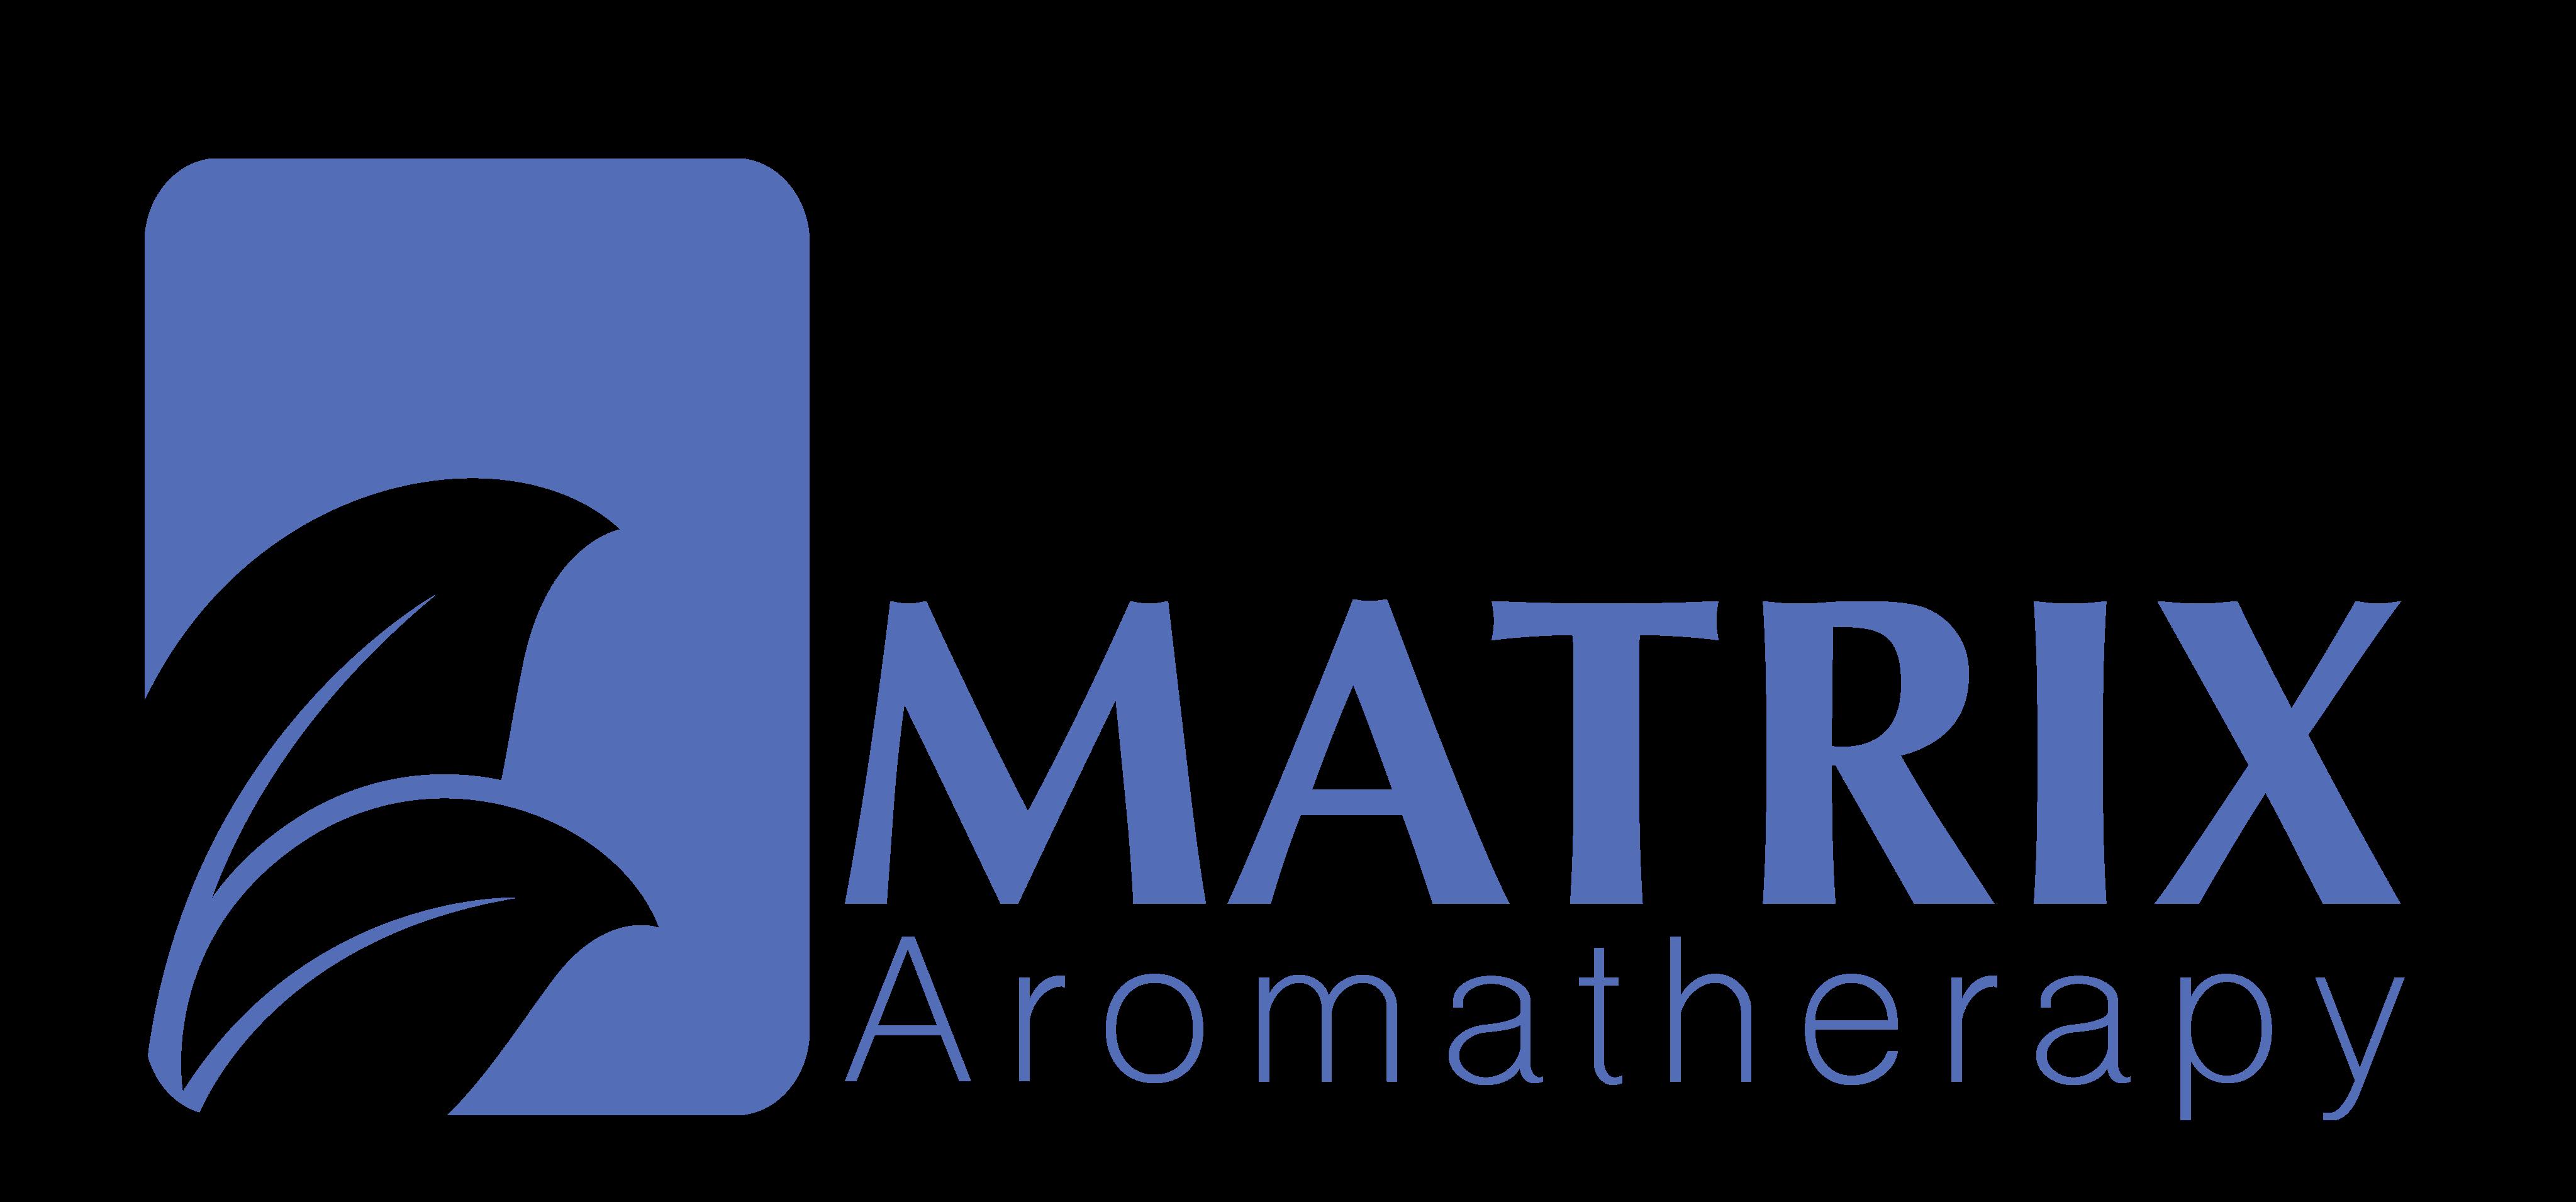 Matrix Aromatherapy logo